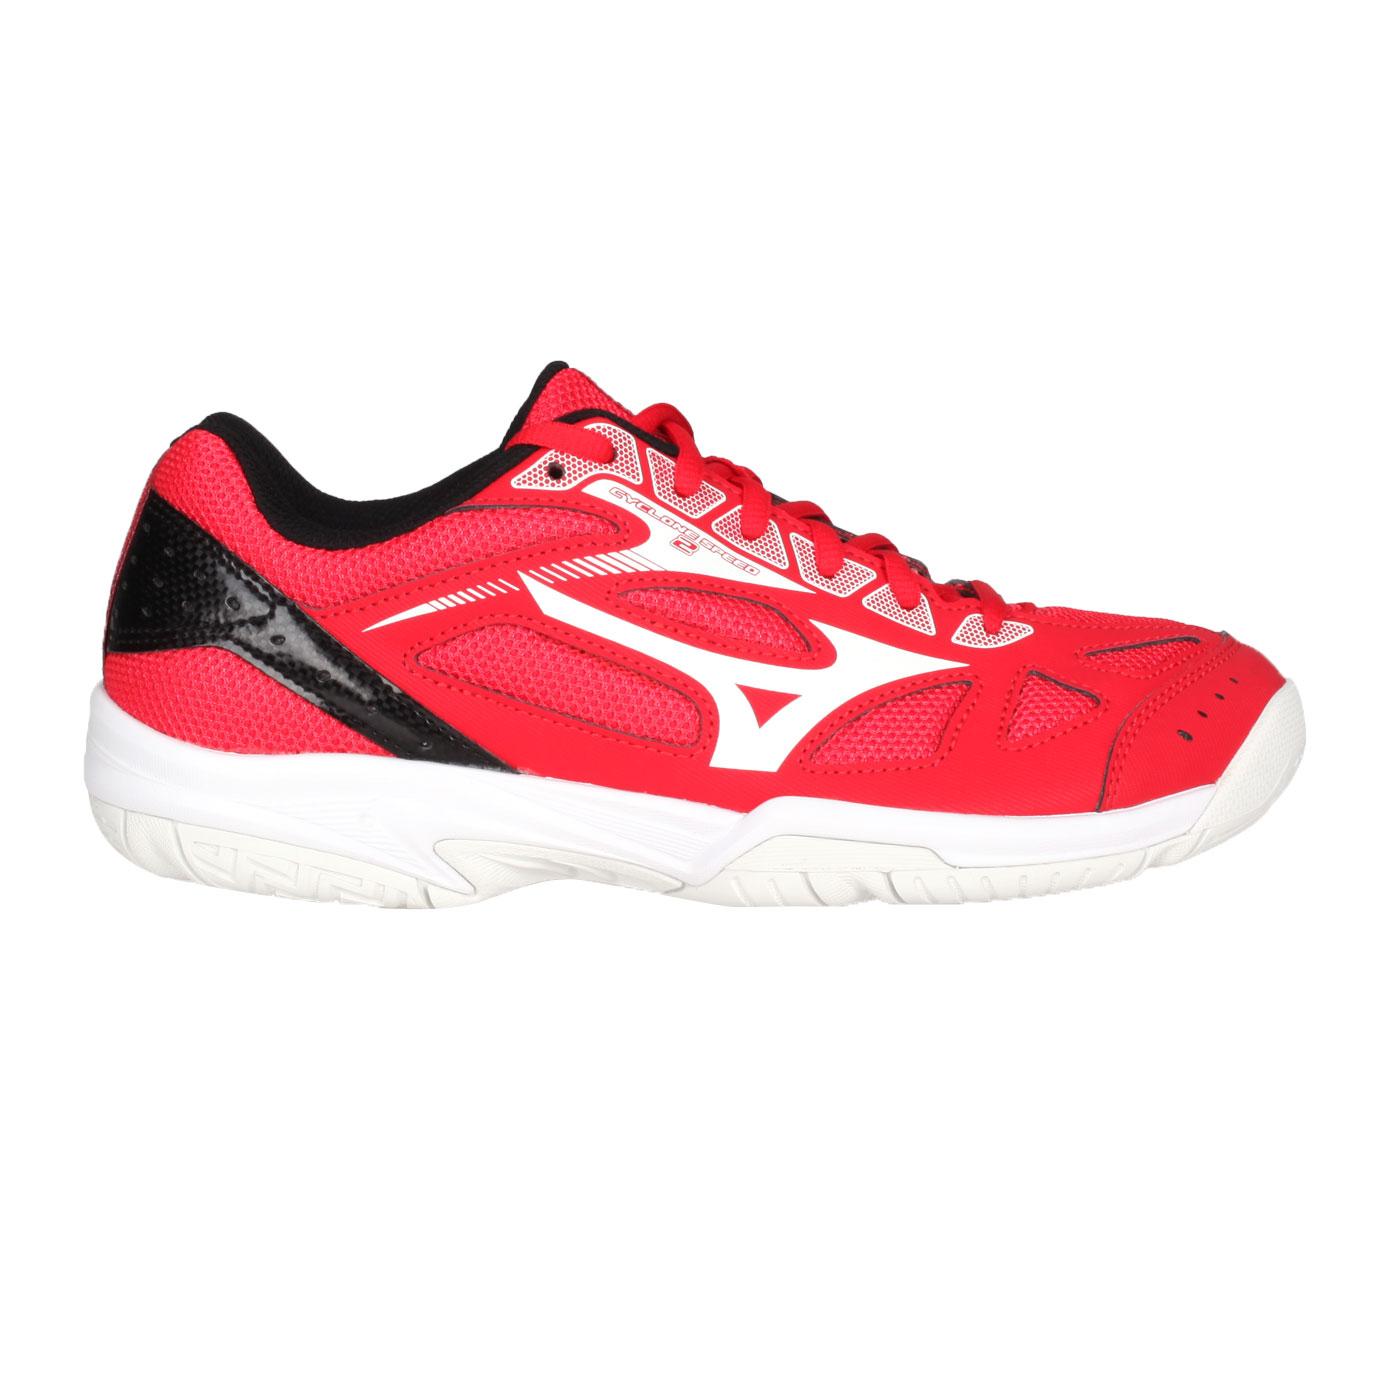 MIZUNO 排球鞋  @CYCLONE SPEED 2@V1GA198002 - 紅白黑